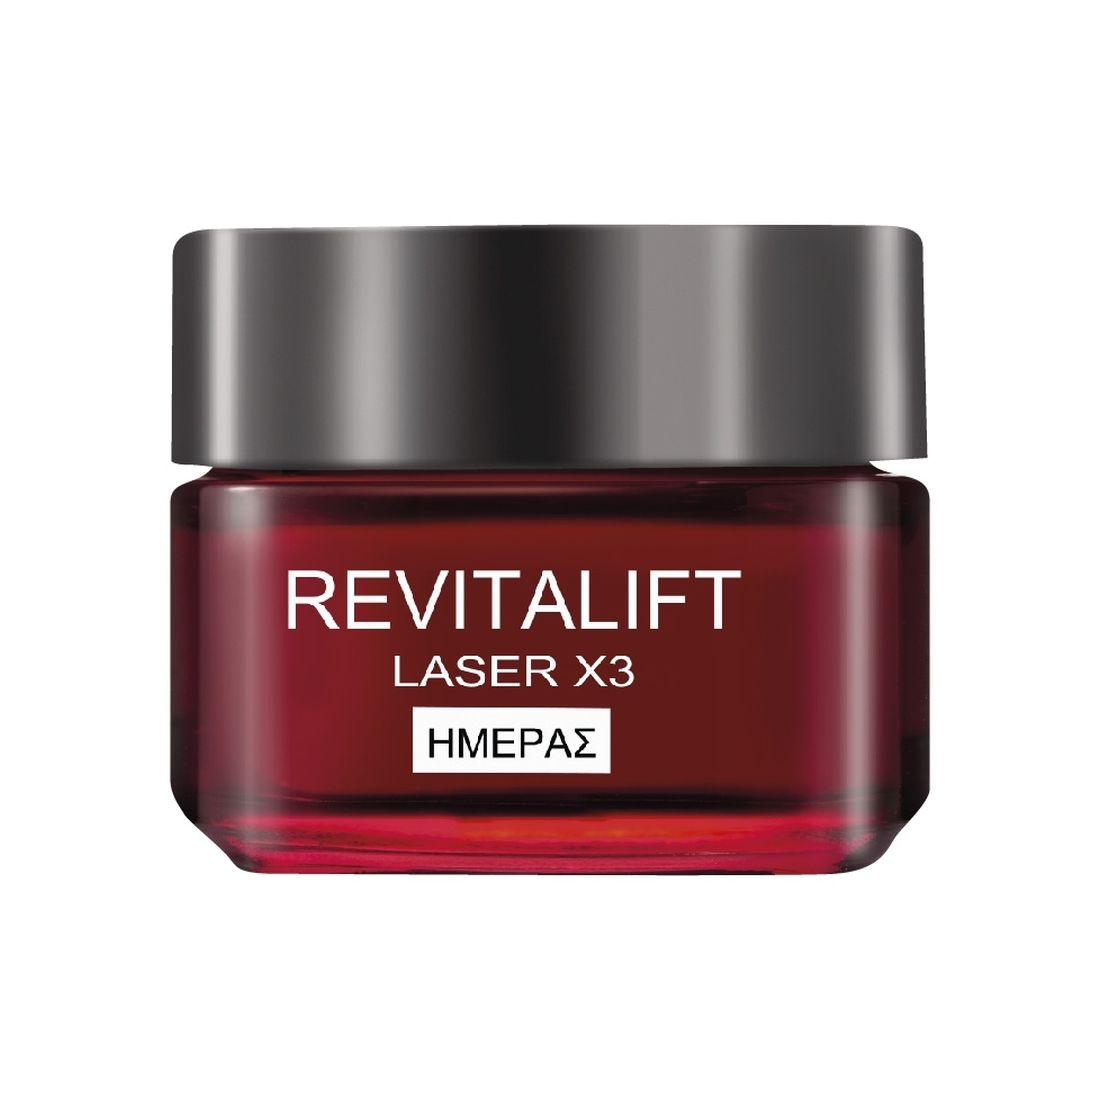 L'Oréal Revitalift Laser Day Cream 50ml  Τύπος Δέρματος : Όλοι οι τύποι